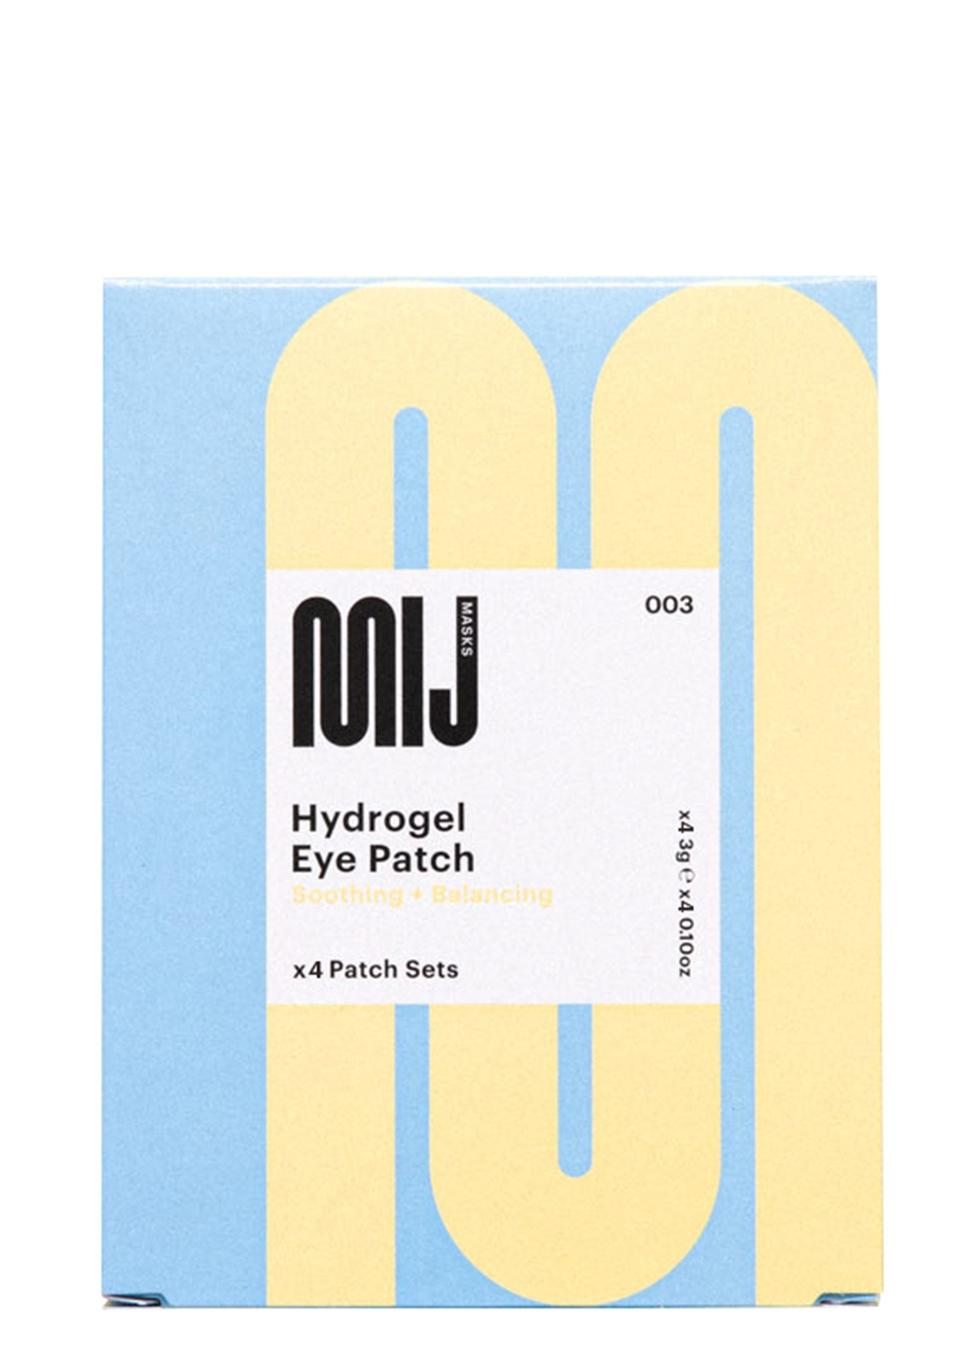 Hydrogel Eye Patches 003